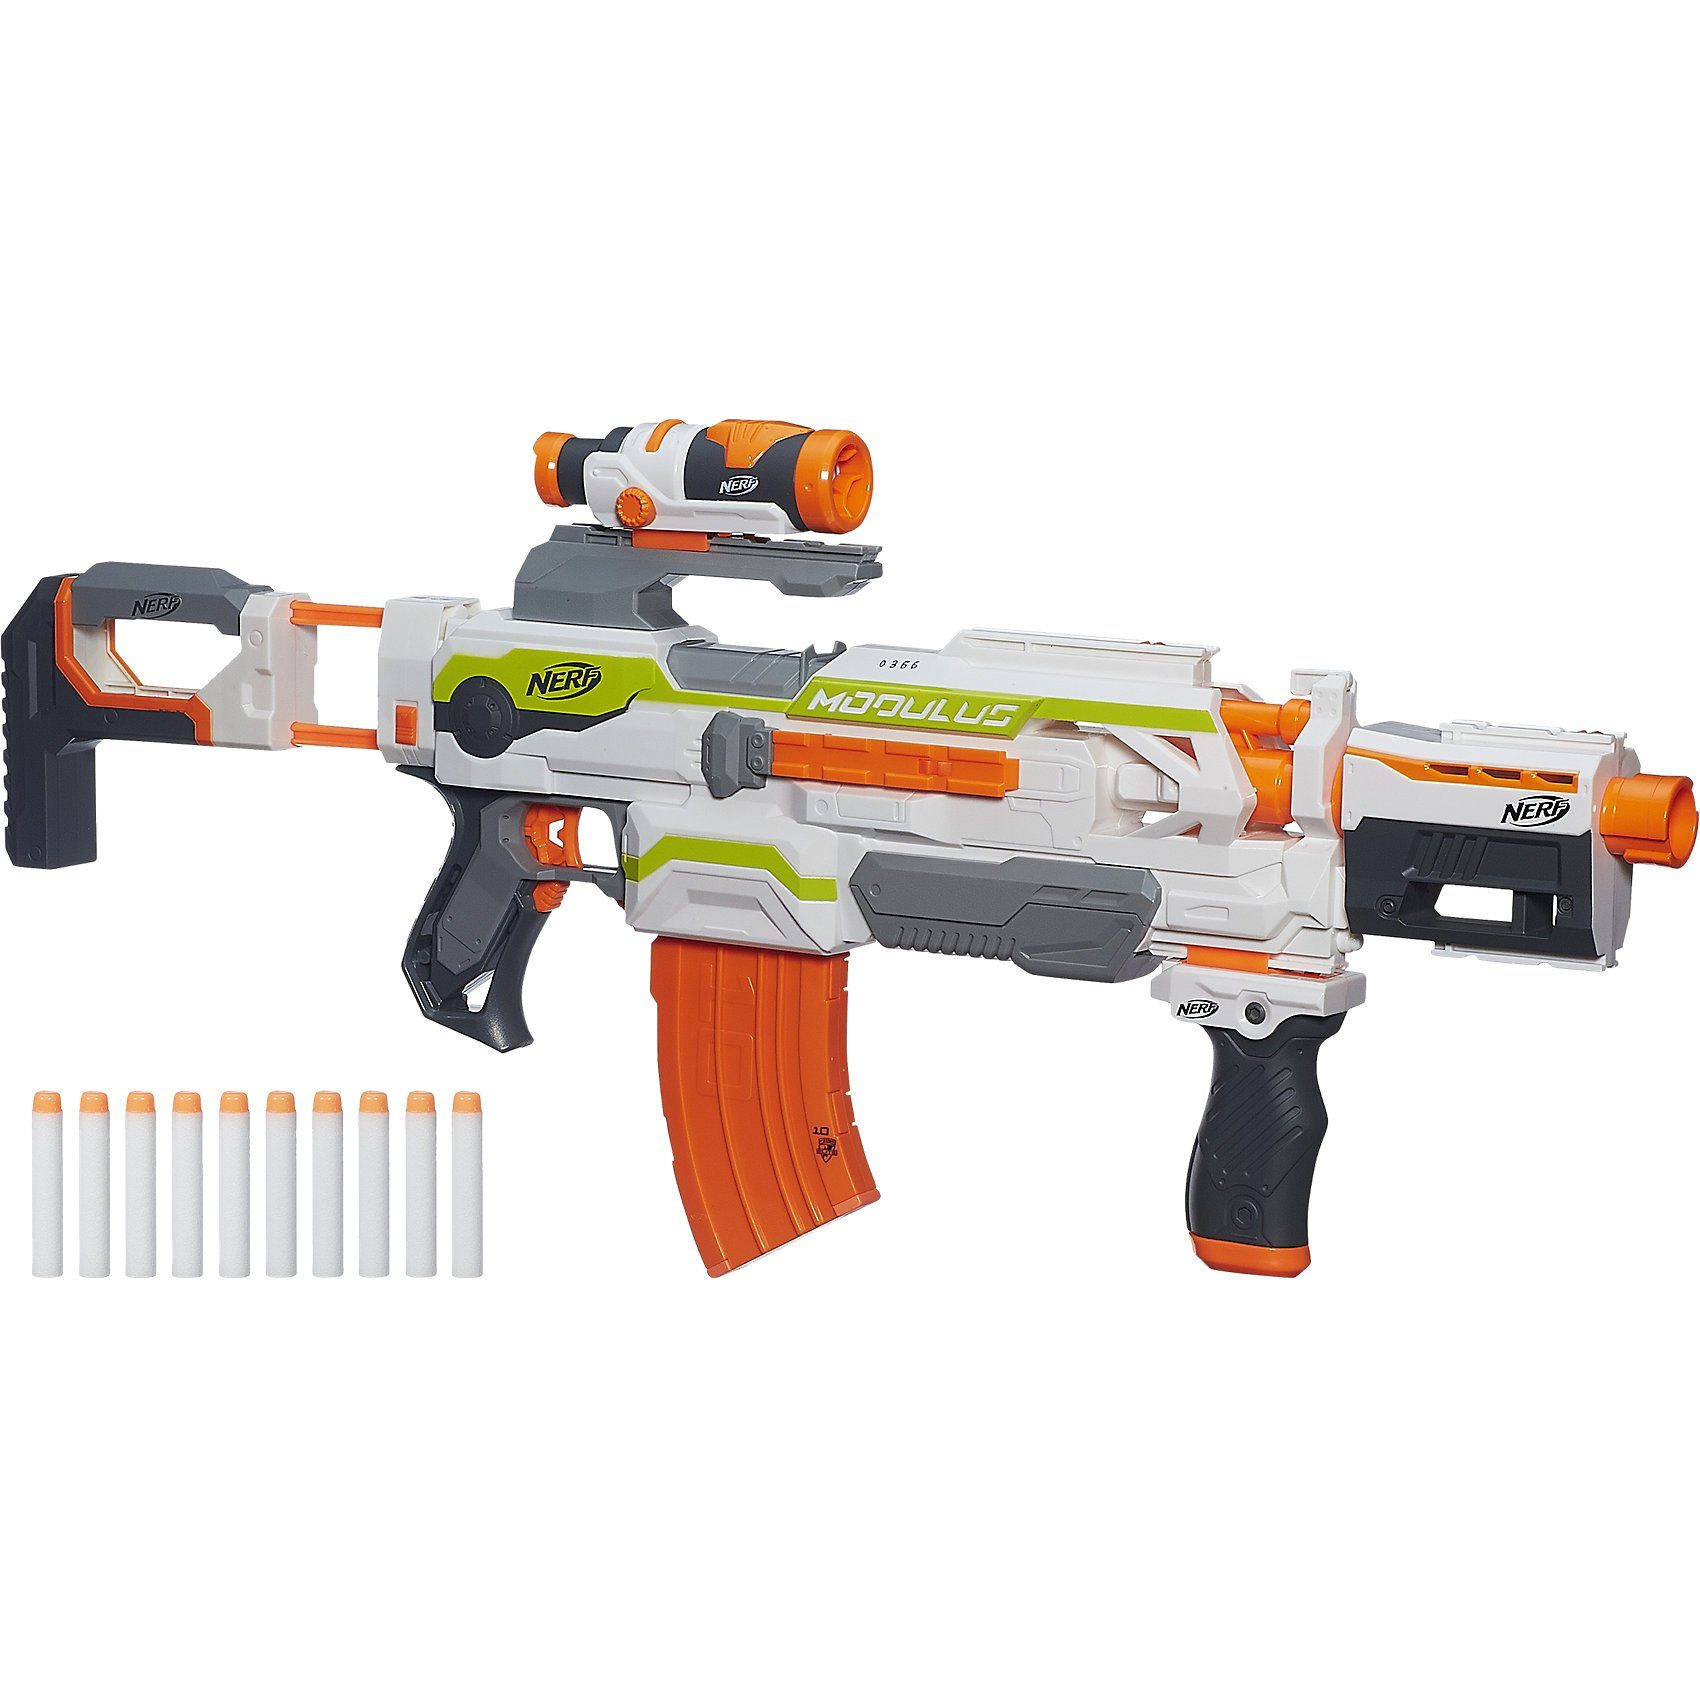 Hasbro NERF N-Strike Elite XD Modulus Blaster